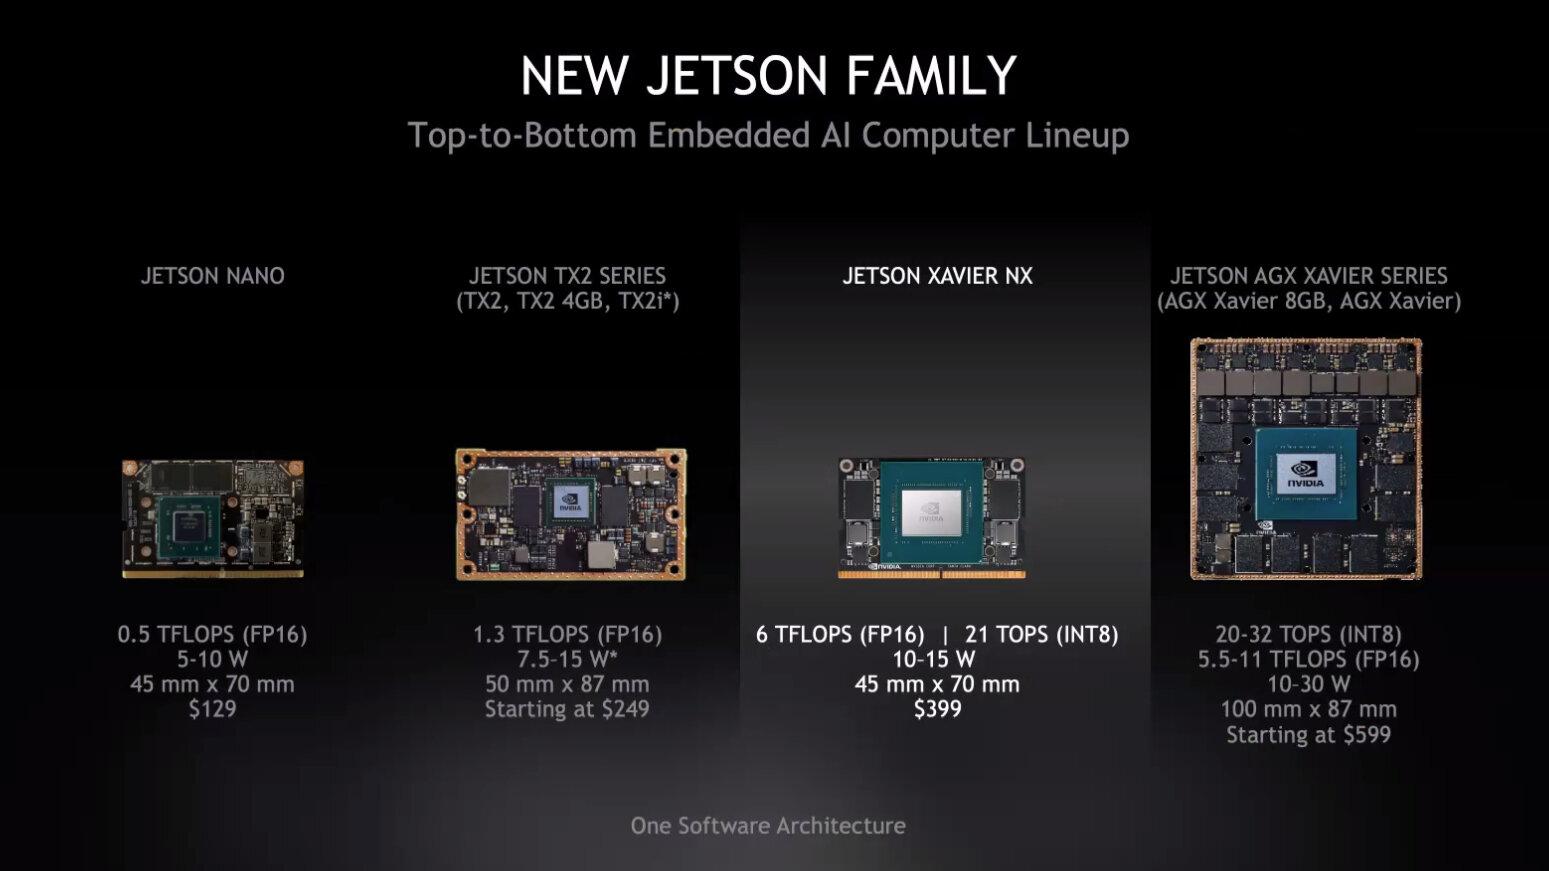 Nvidias Jetson-Familie mit neuem Jetson Xavier NX